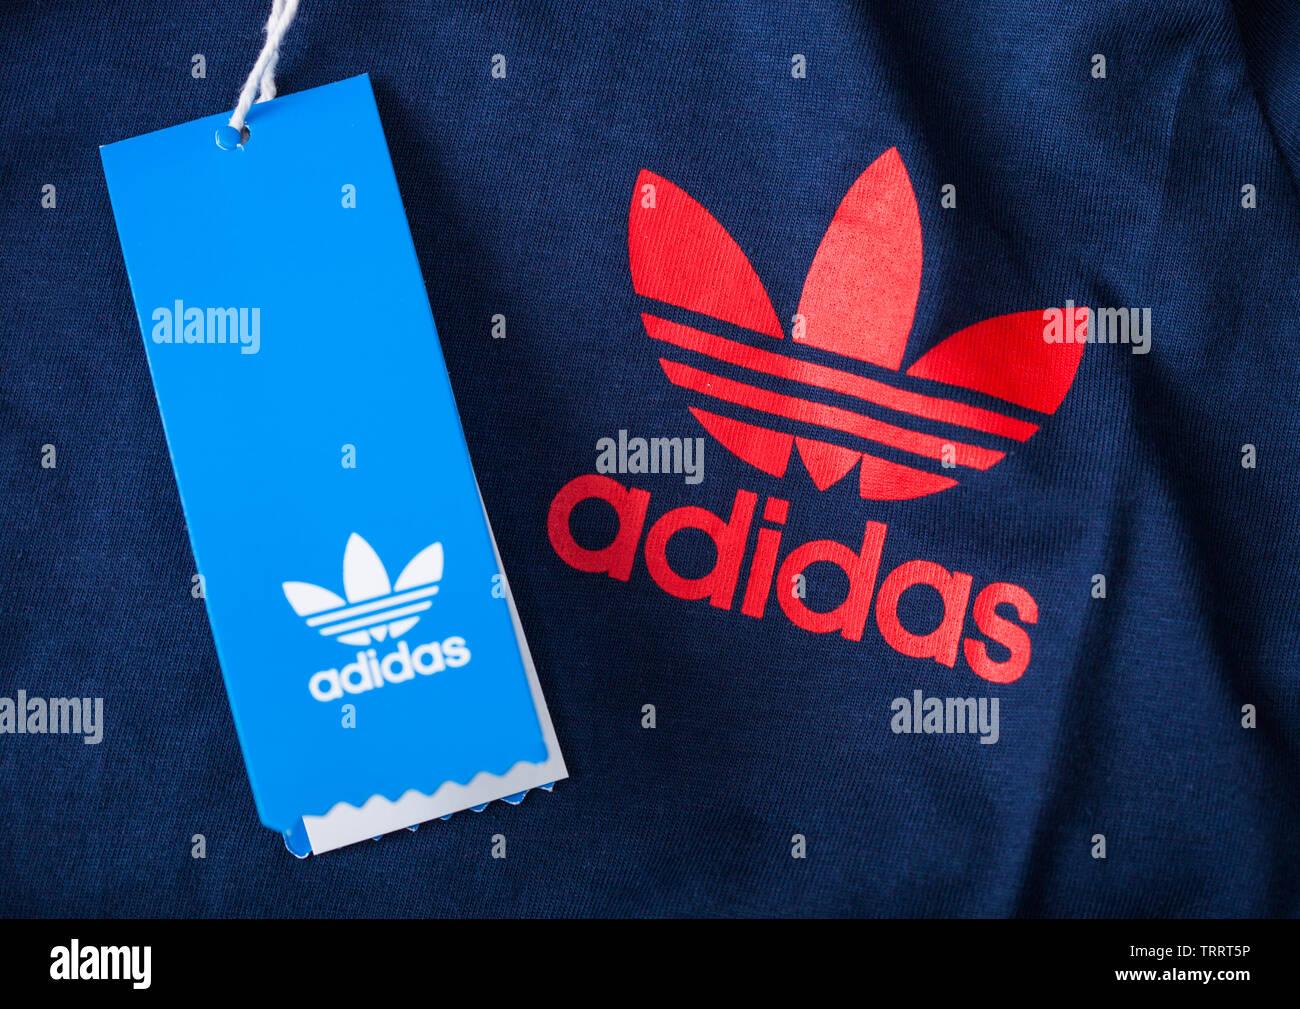 Adidas Originale Stockfotos & Adidas Originale Bilder Alamy